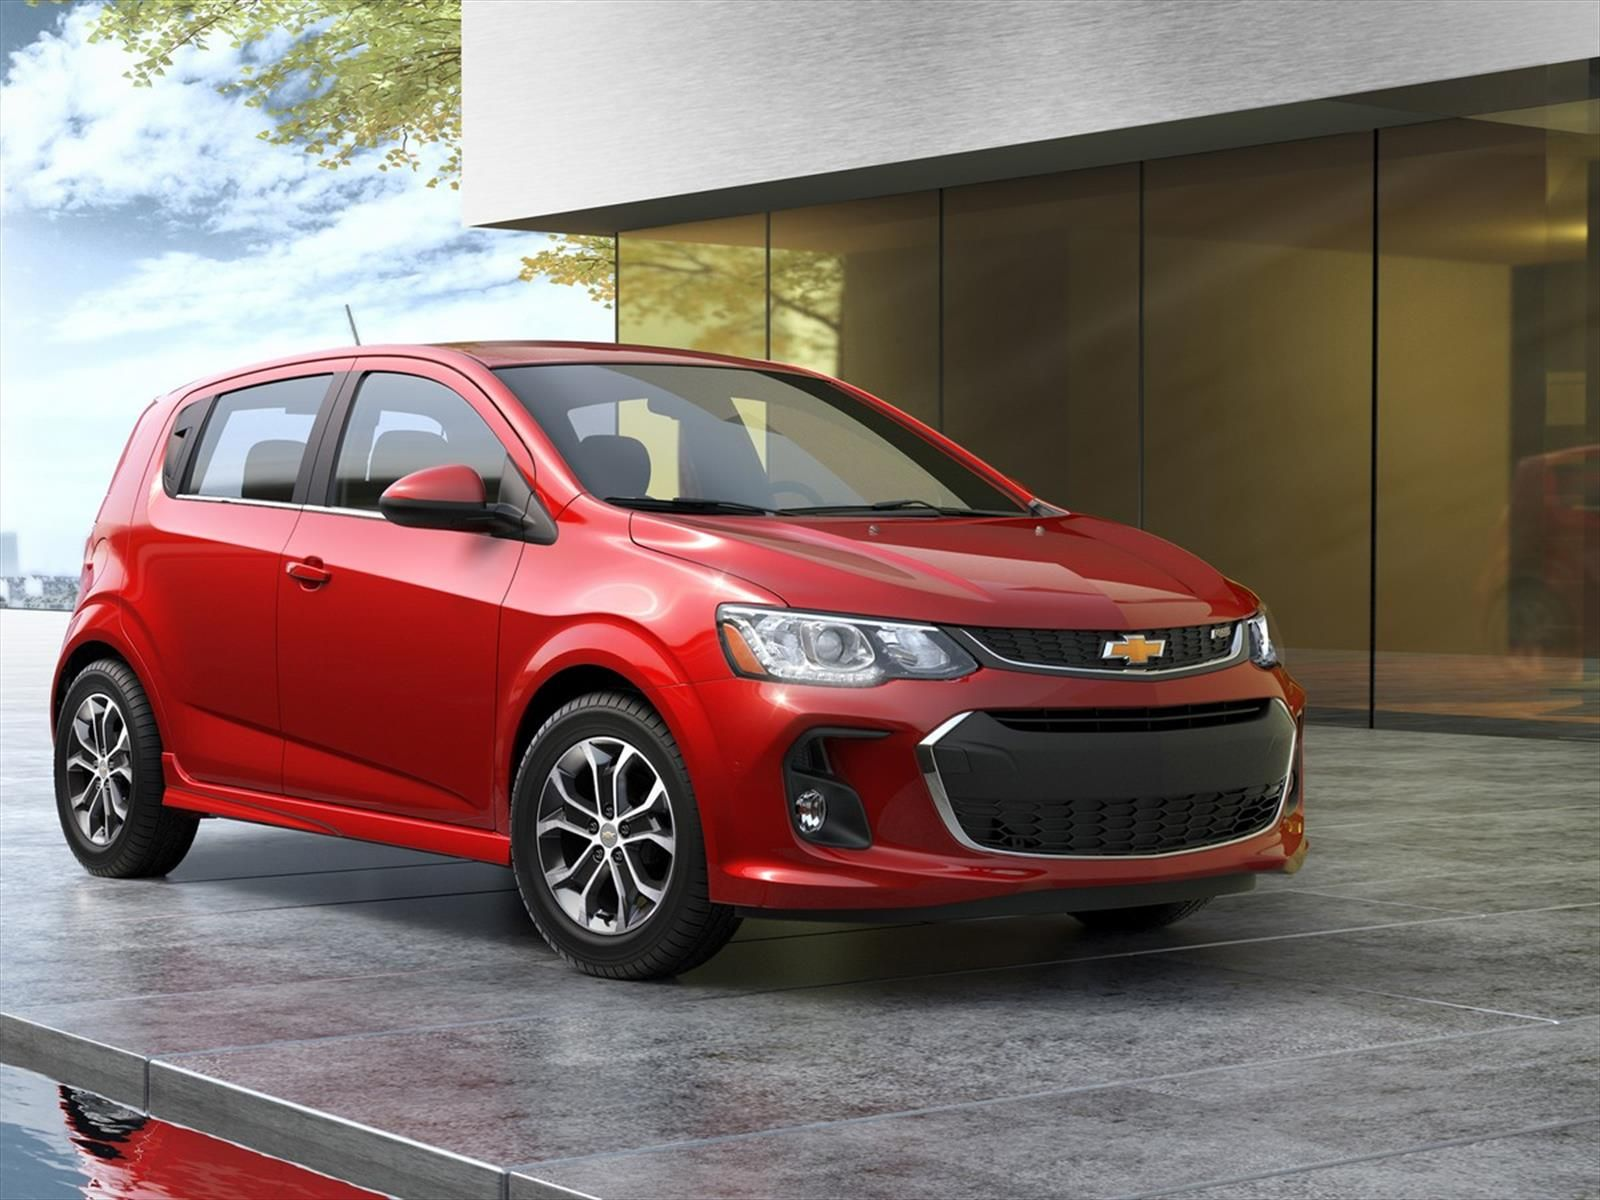 Chevrolet Sonic 2017 Venta De Autos Aveo 2017 Chevrolet Sonic 2017